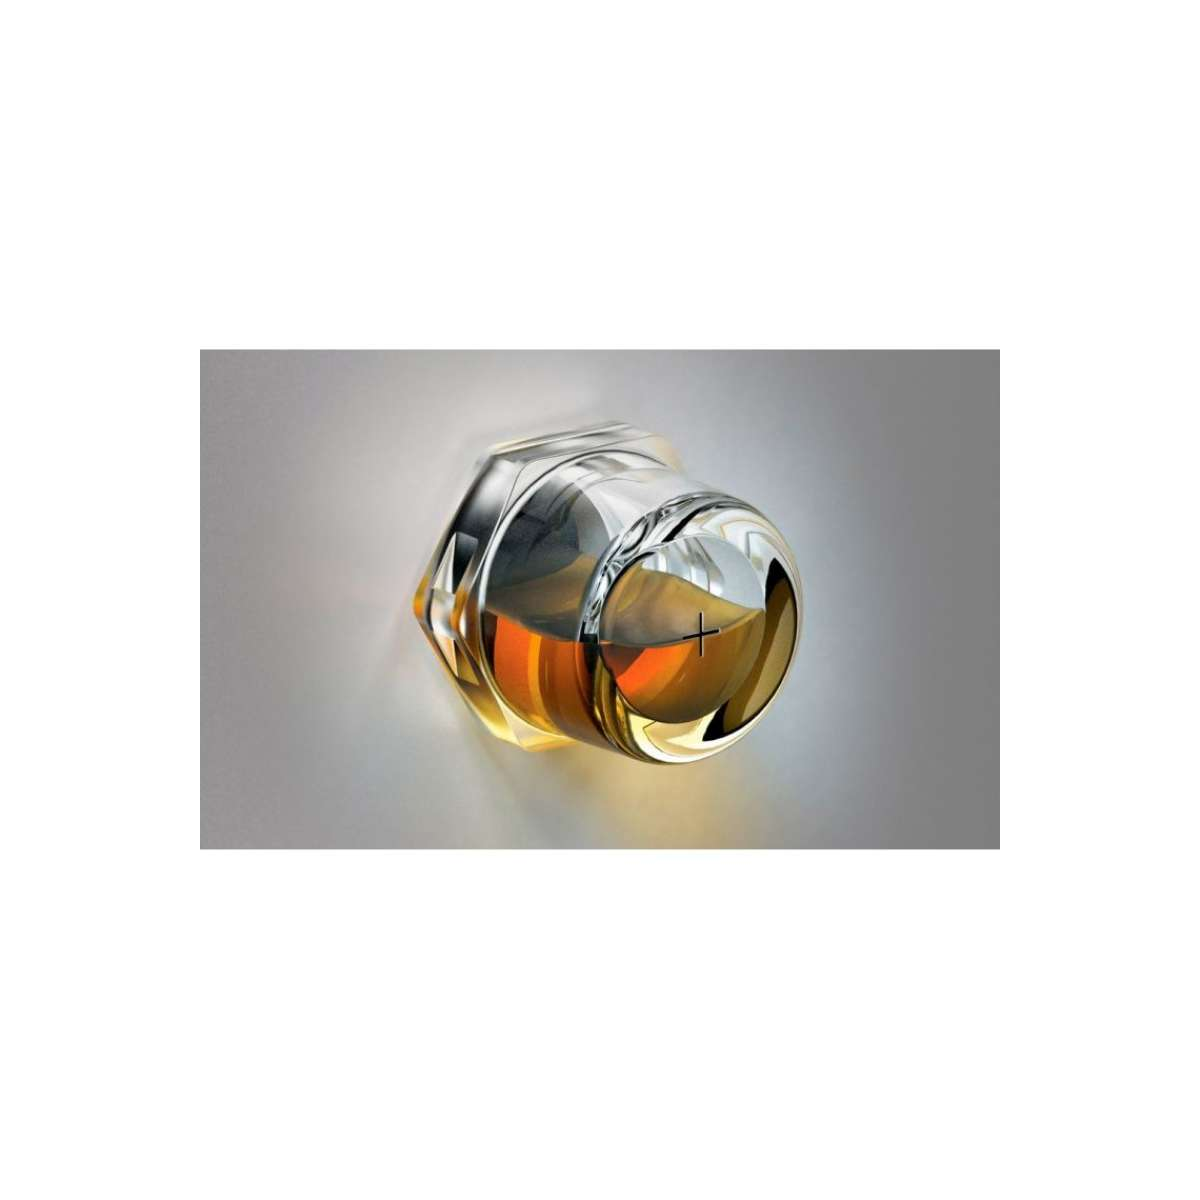 "3D Sight Glass 1-1/4"" NPT"